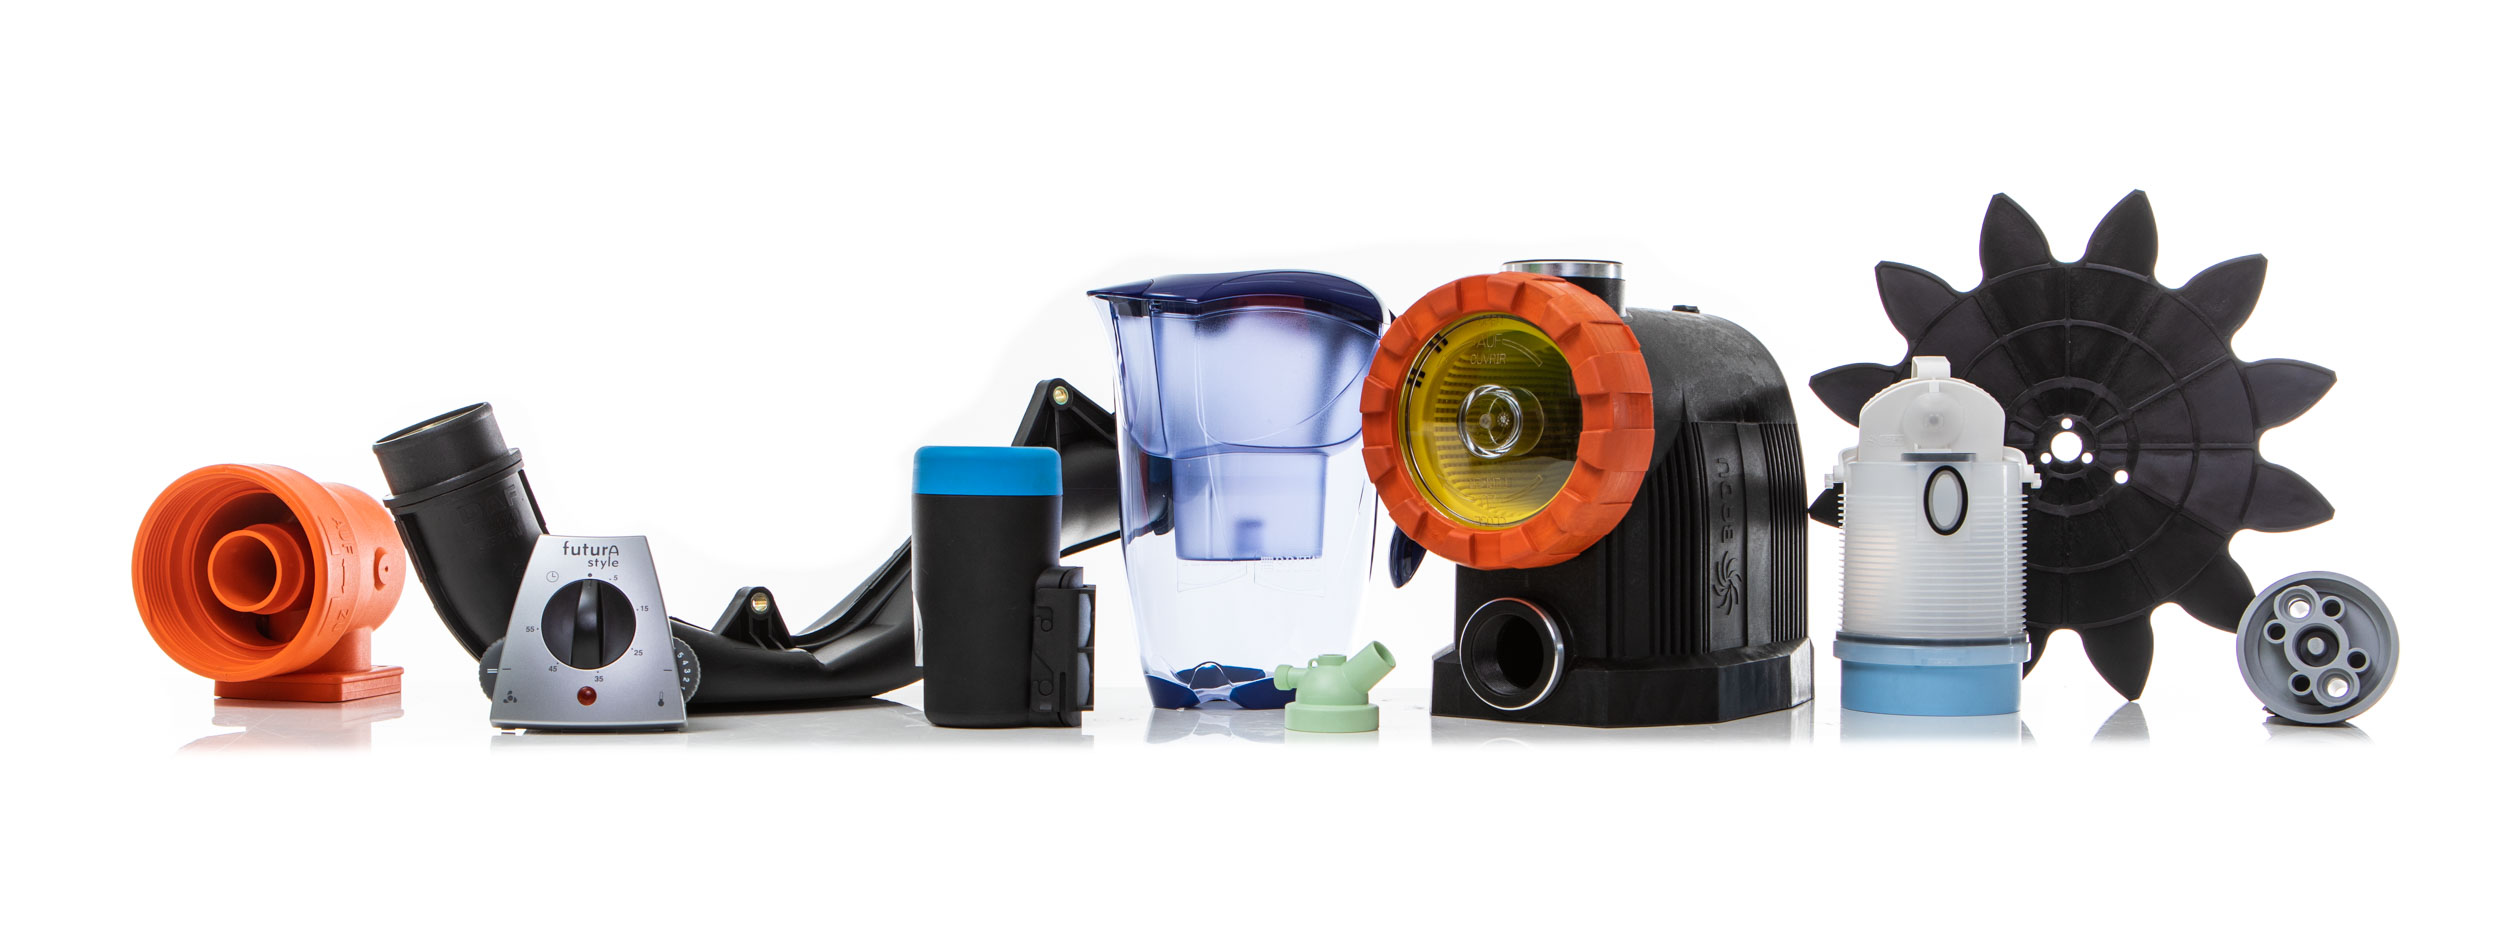 Kunststoffverarbeitung Winter Produktpalette Prototypen Spritzgussteile Kunststoff